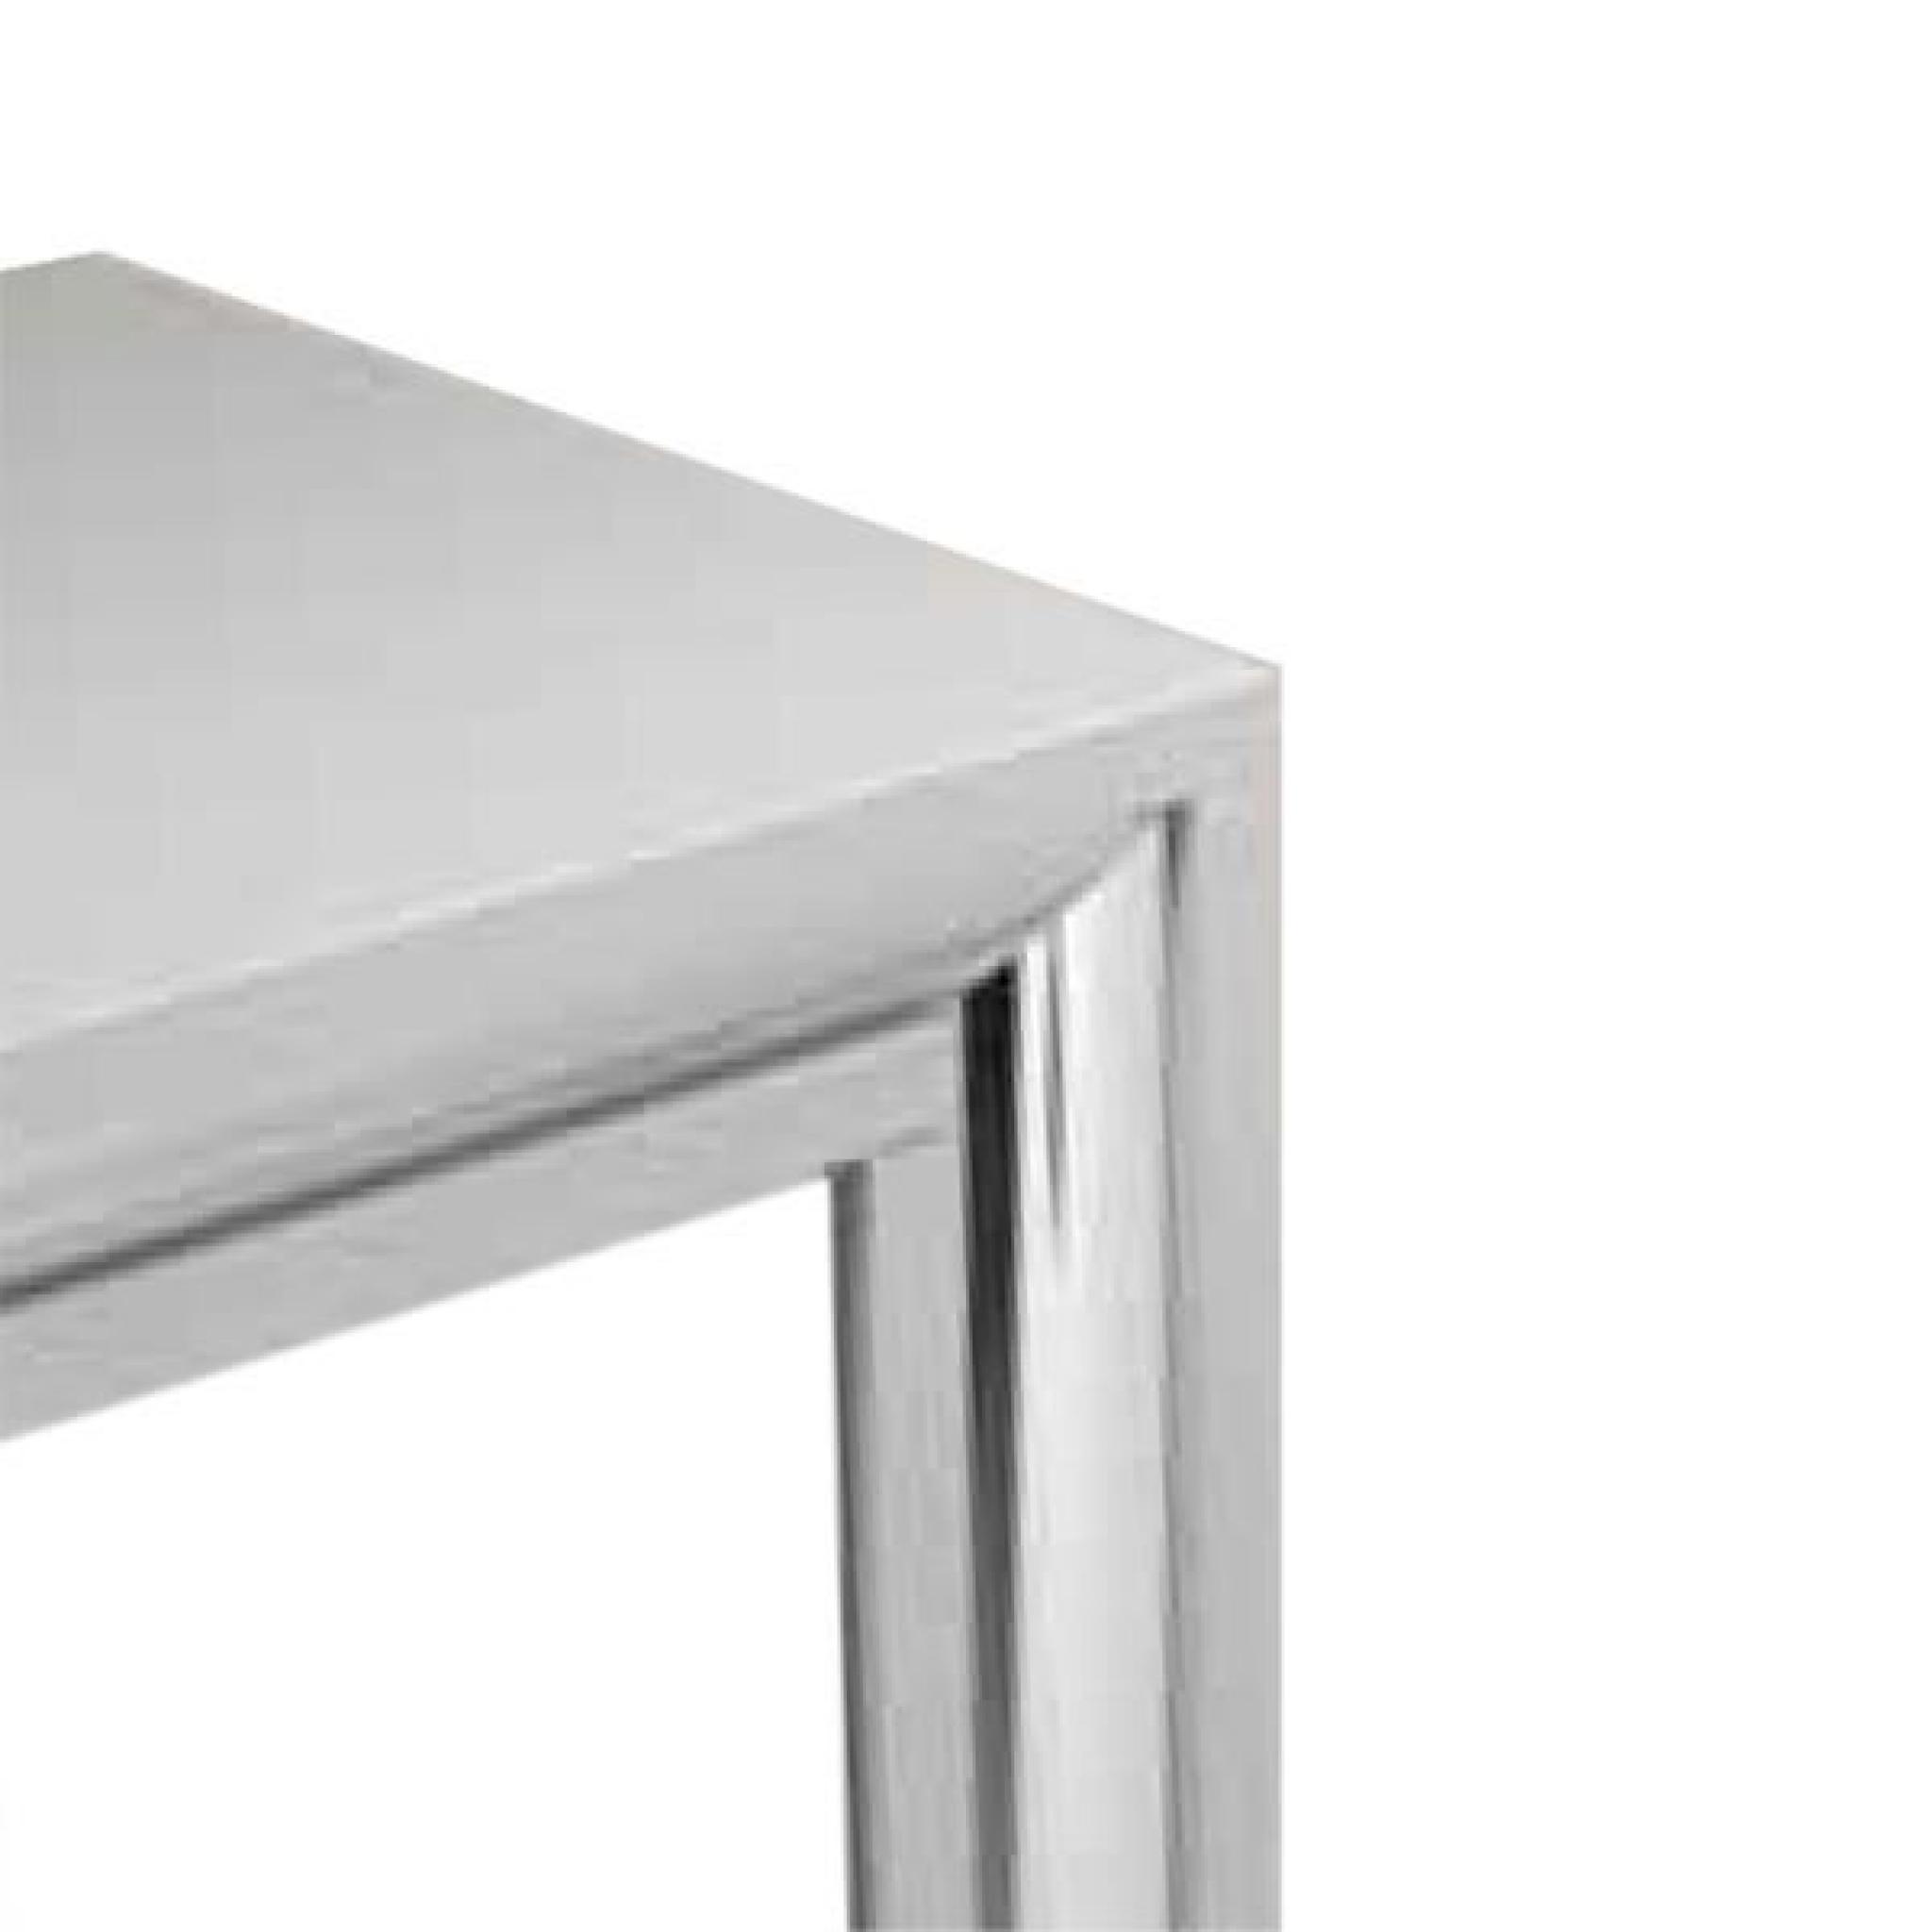 console syra bois gris insert chrom achat vente console. Black Bedroom Furniture Sets. Home Design Ideas